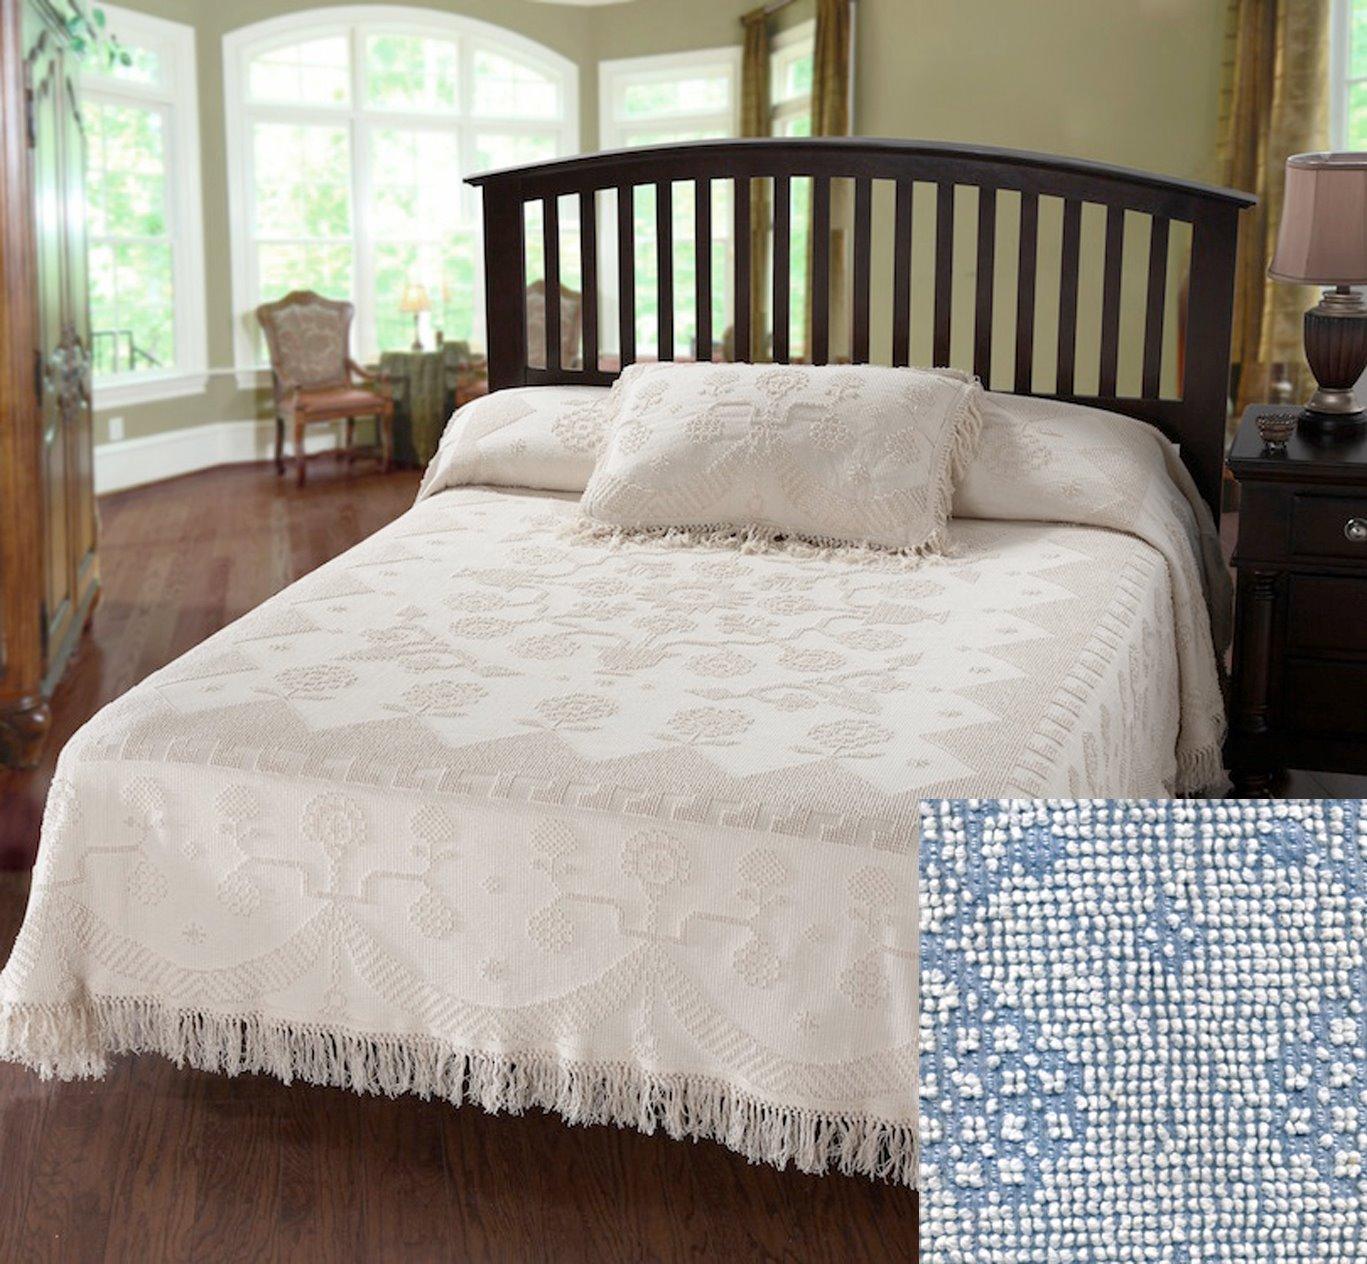 George Washington Bedspread Twin Blue